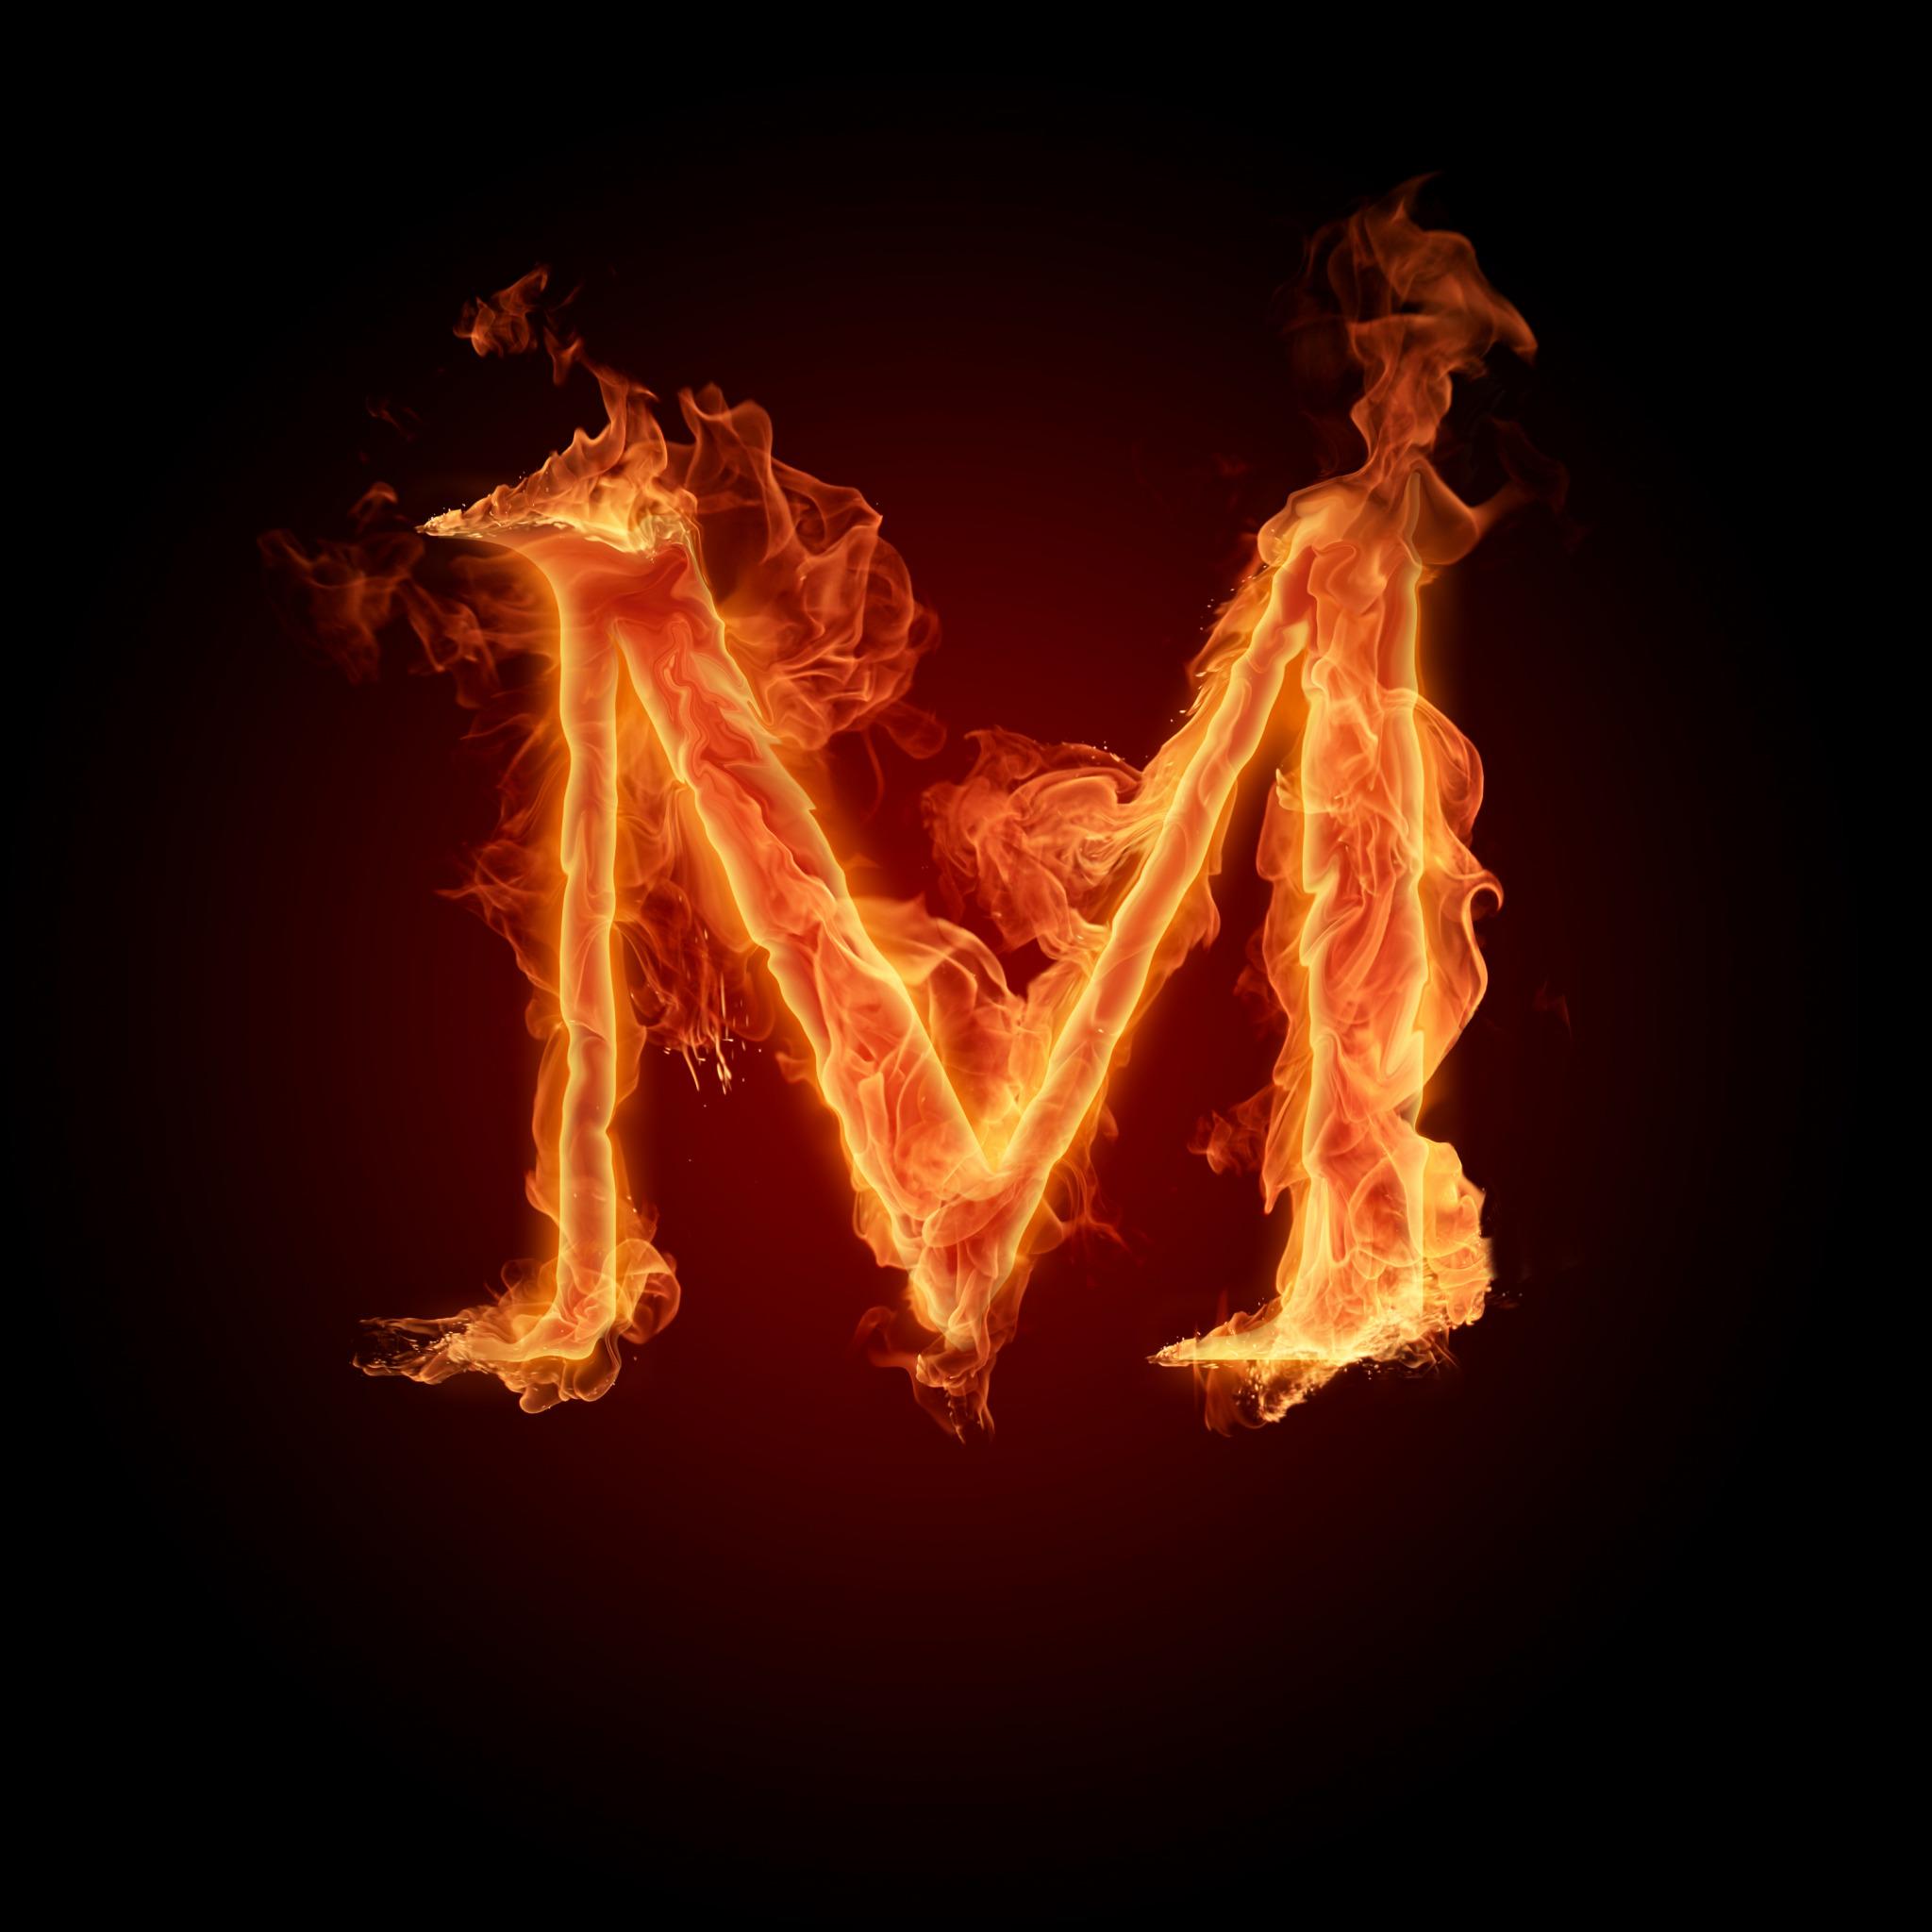 Картинка для аватарки 4 буквы